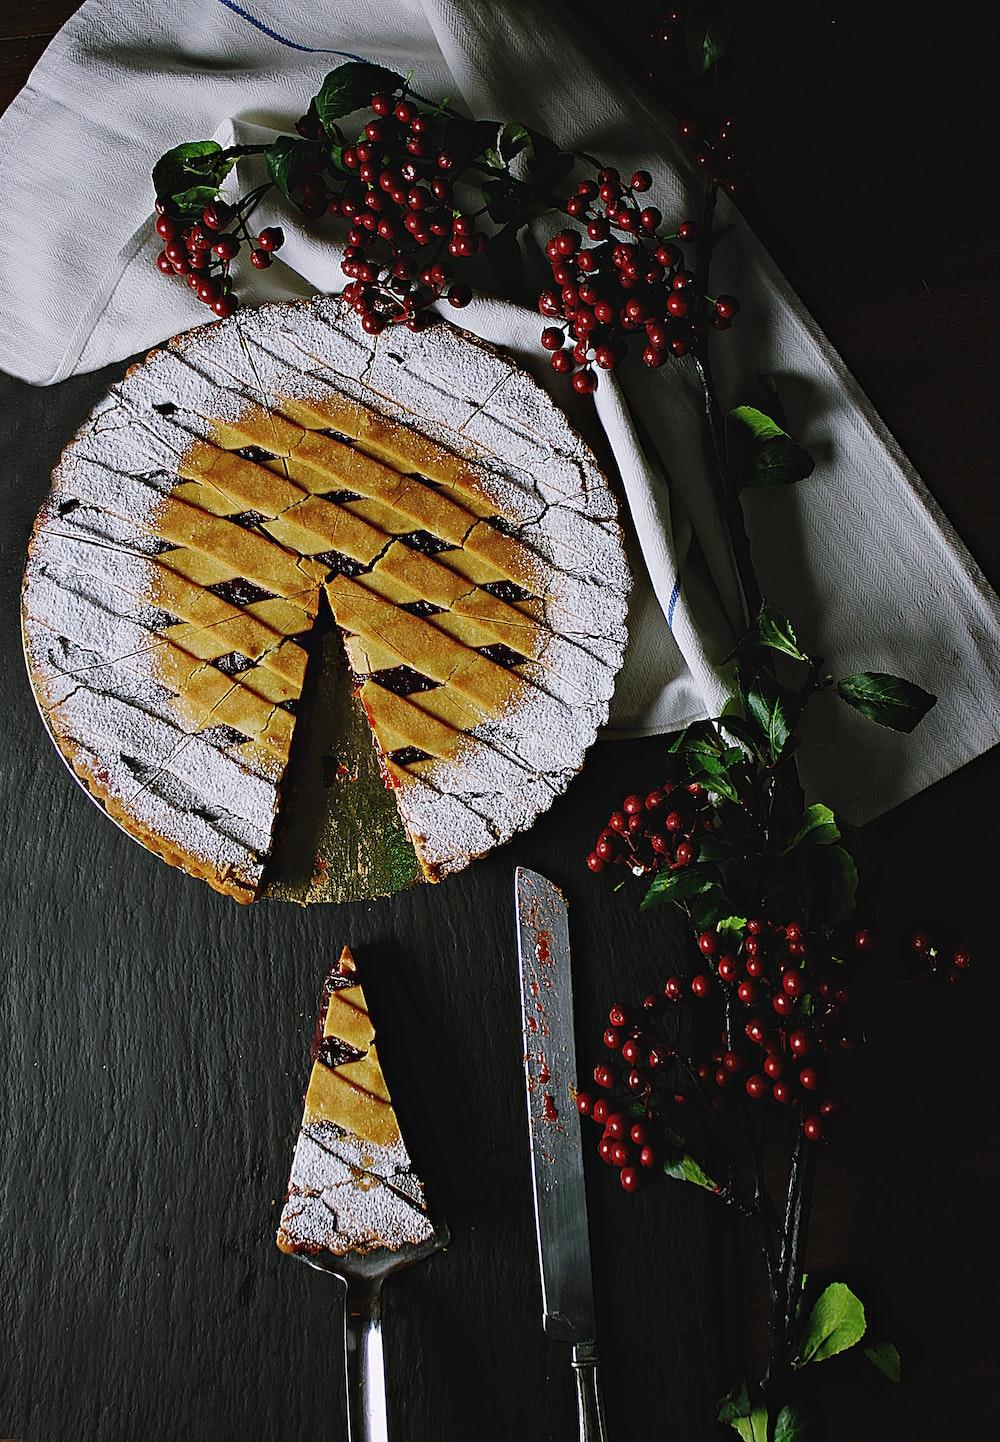 baked sliced cherry pie